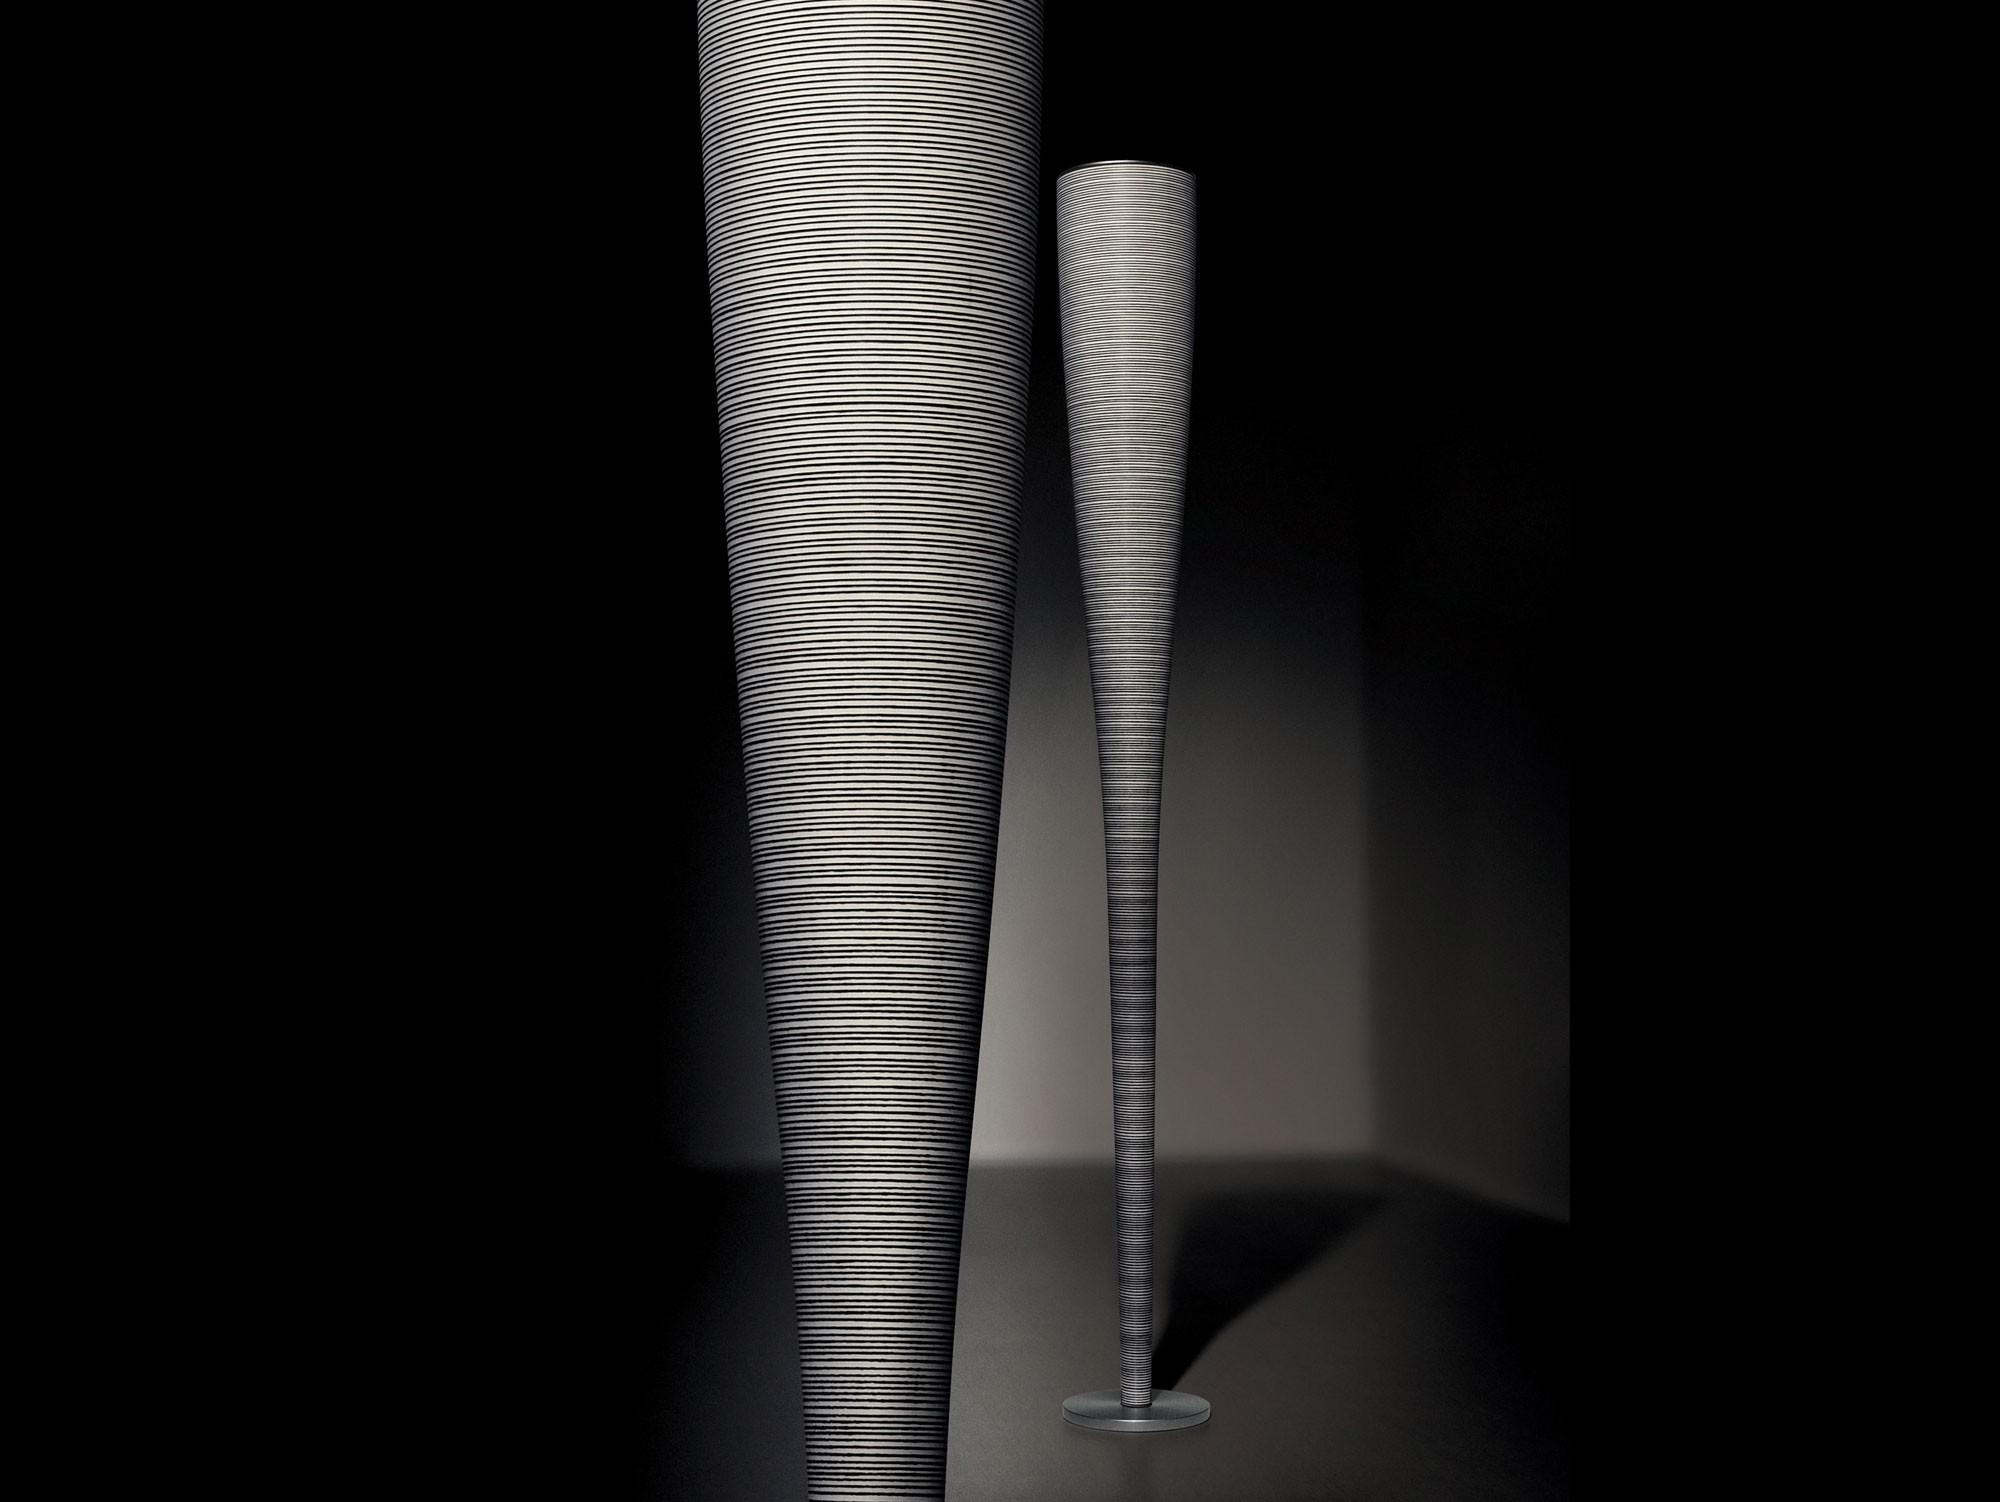 Mite lamp by Marc Sadler